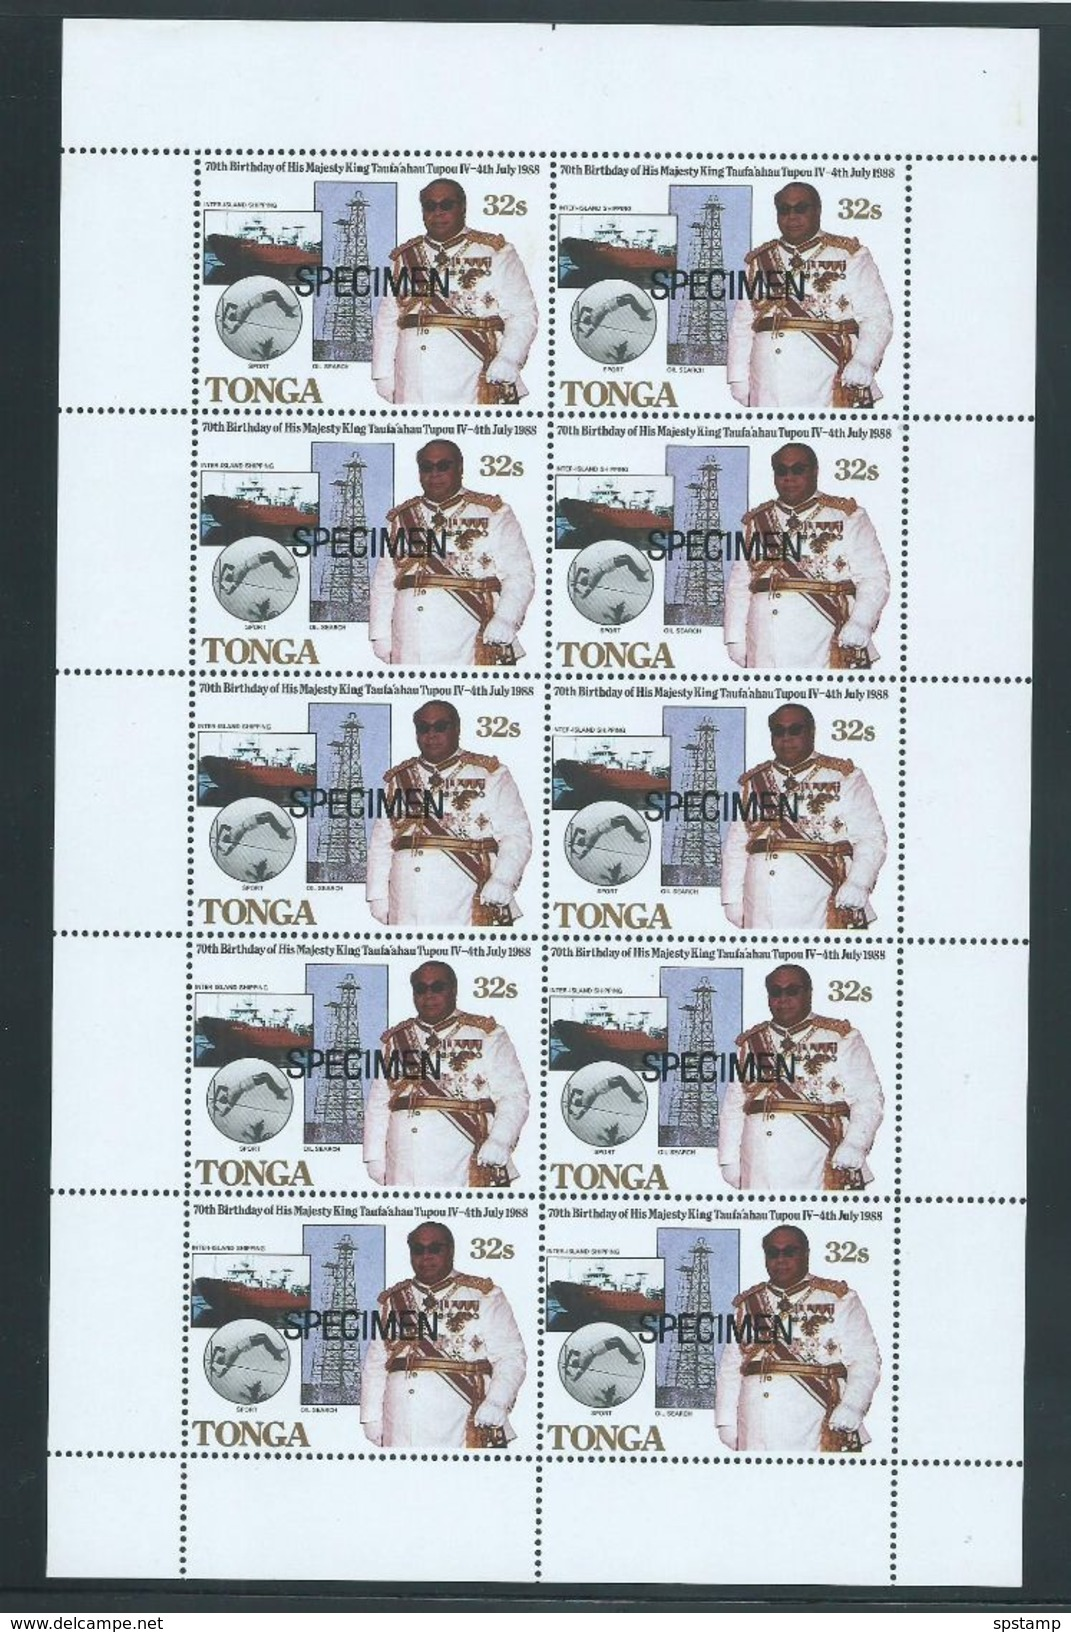 Tonga 1988 King's Birthday Set 4 X 10 In Full Sheets MNH Specimen Overprint - Tonga (1970-...)